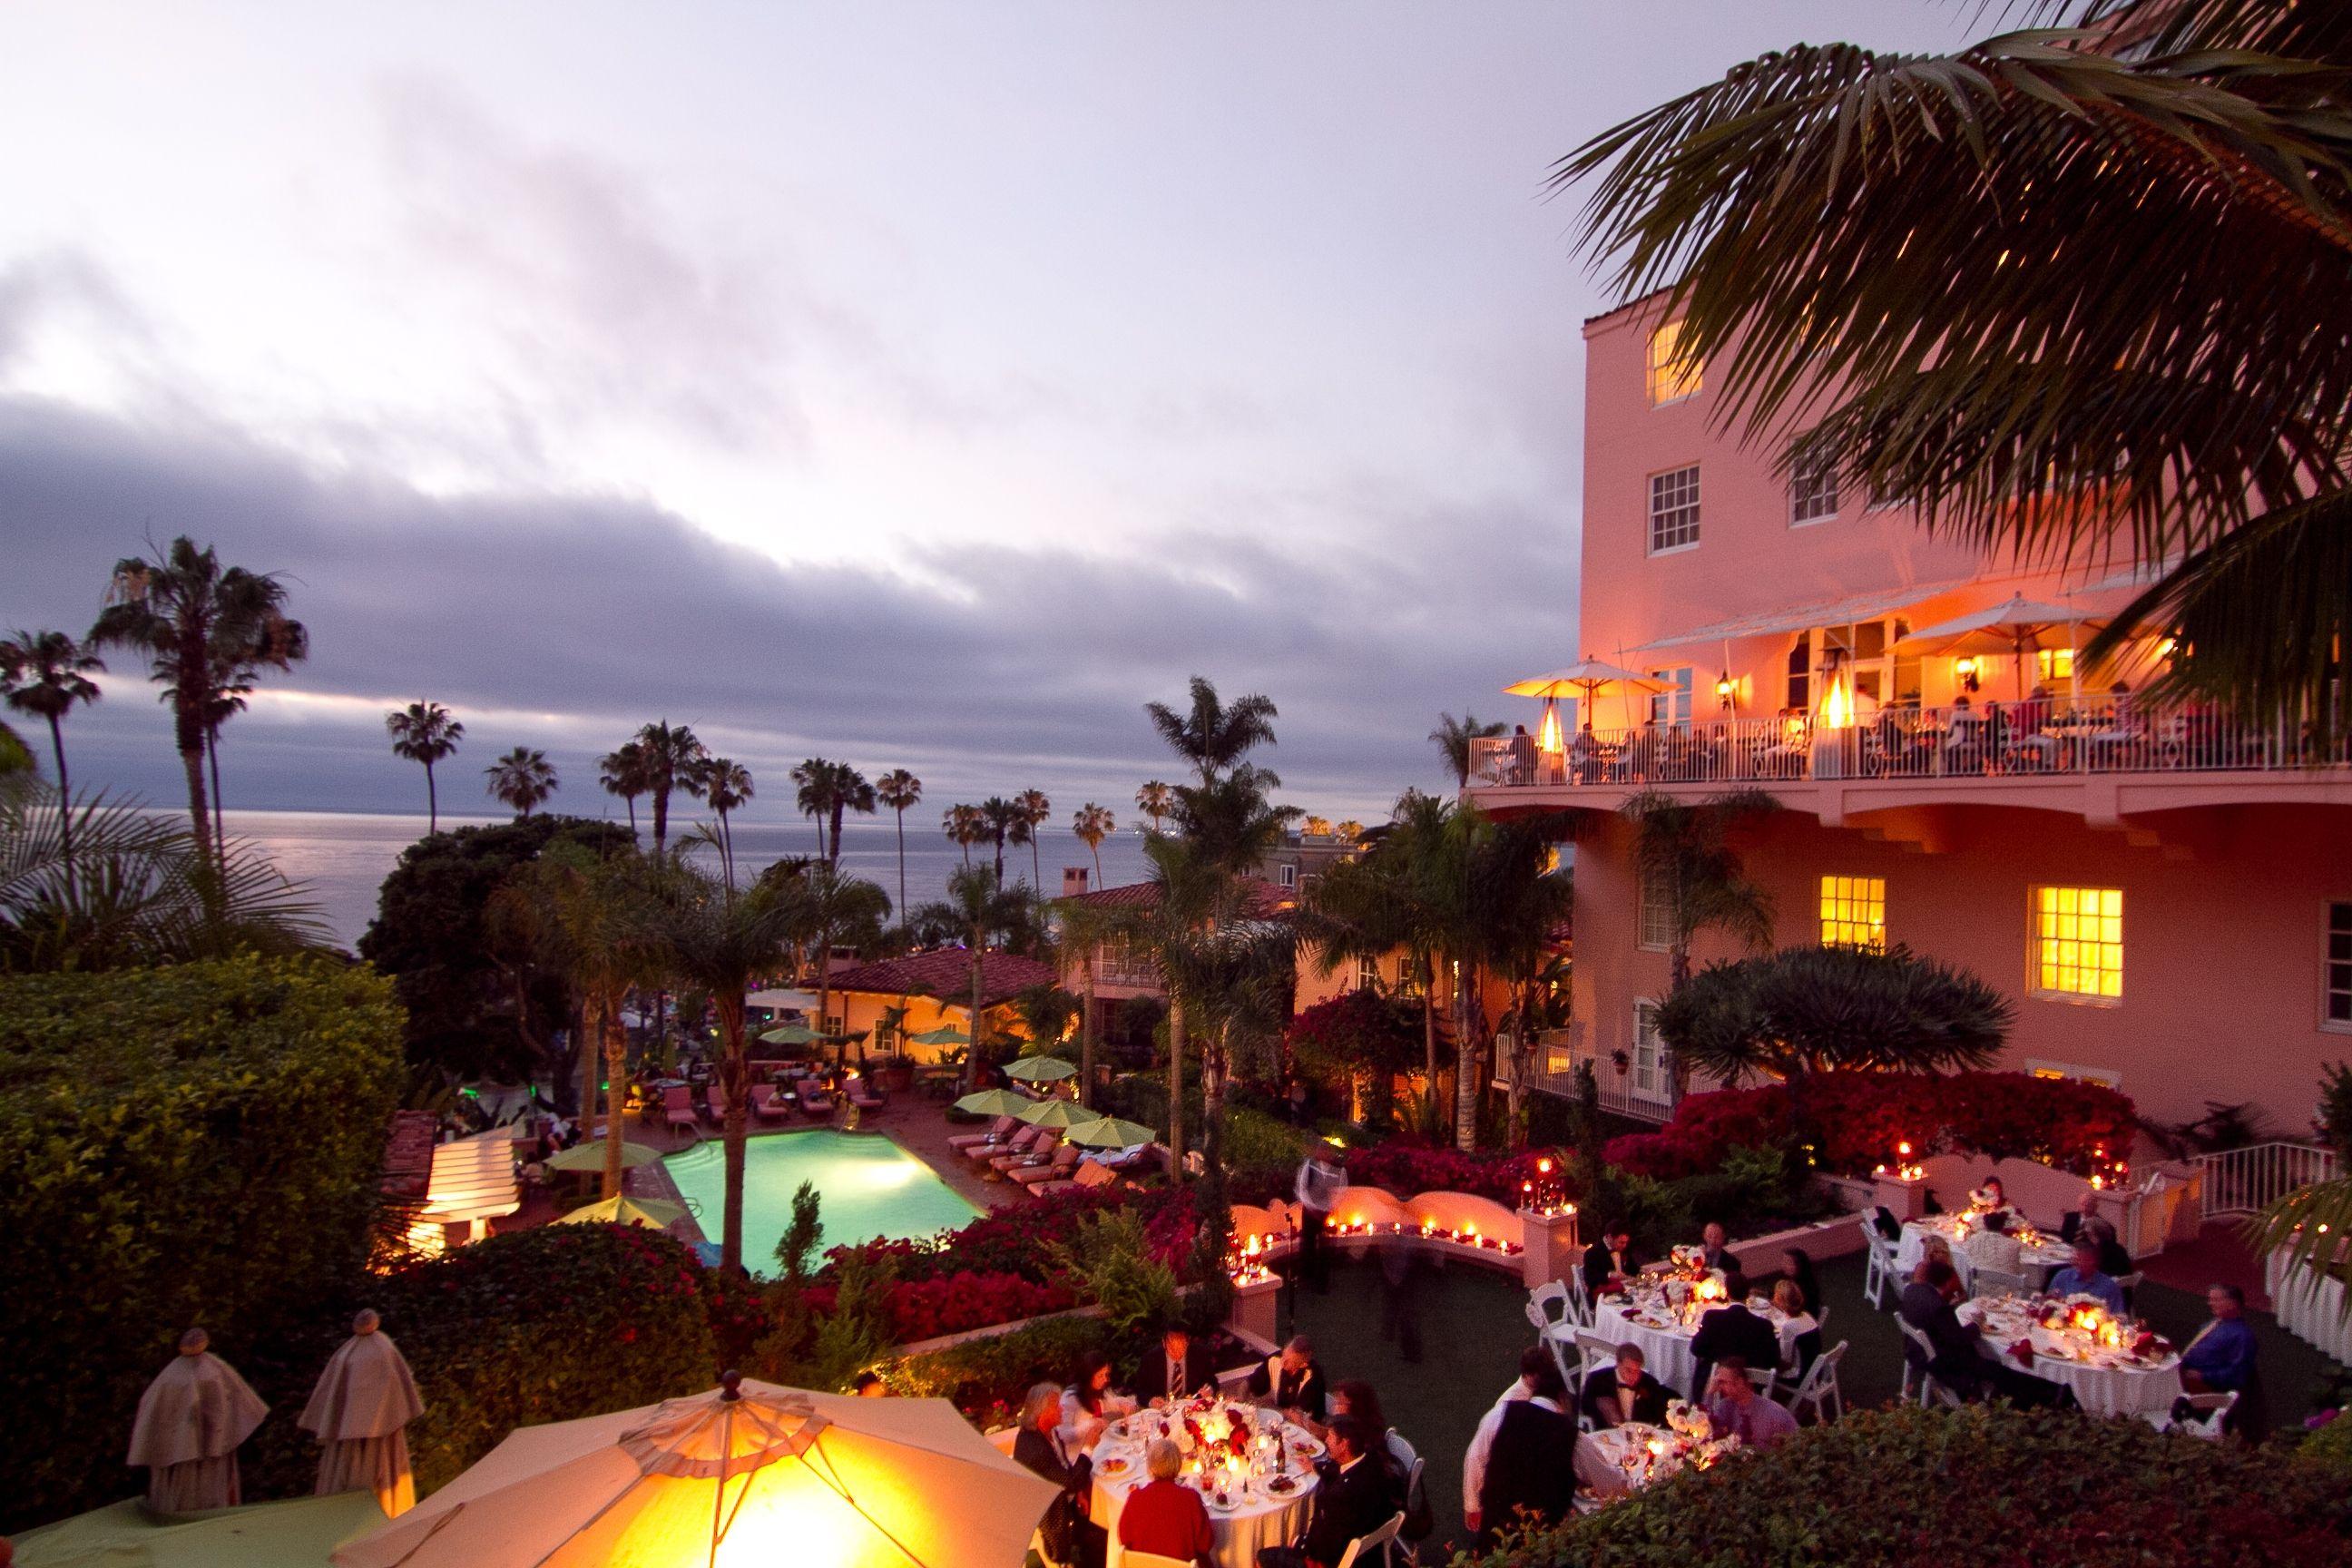 A Garden Dinner La Valencia Hotel La Jolla Hotels La Jolla